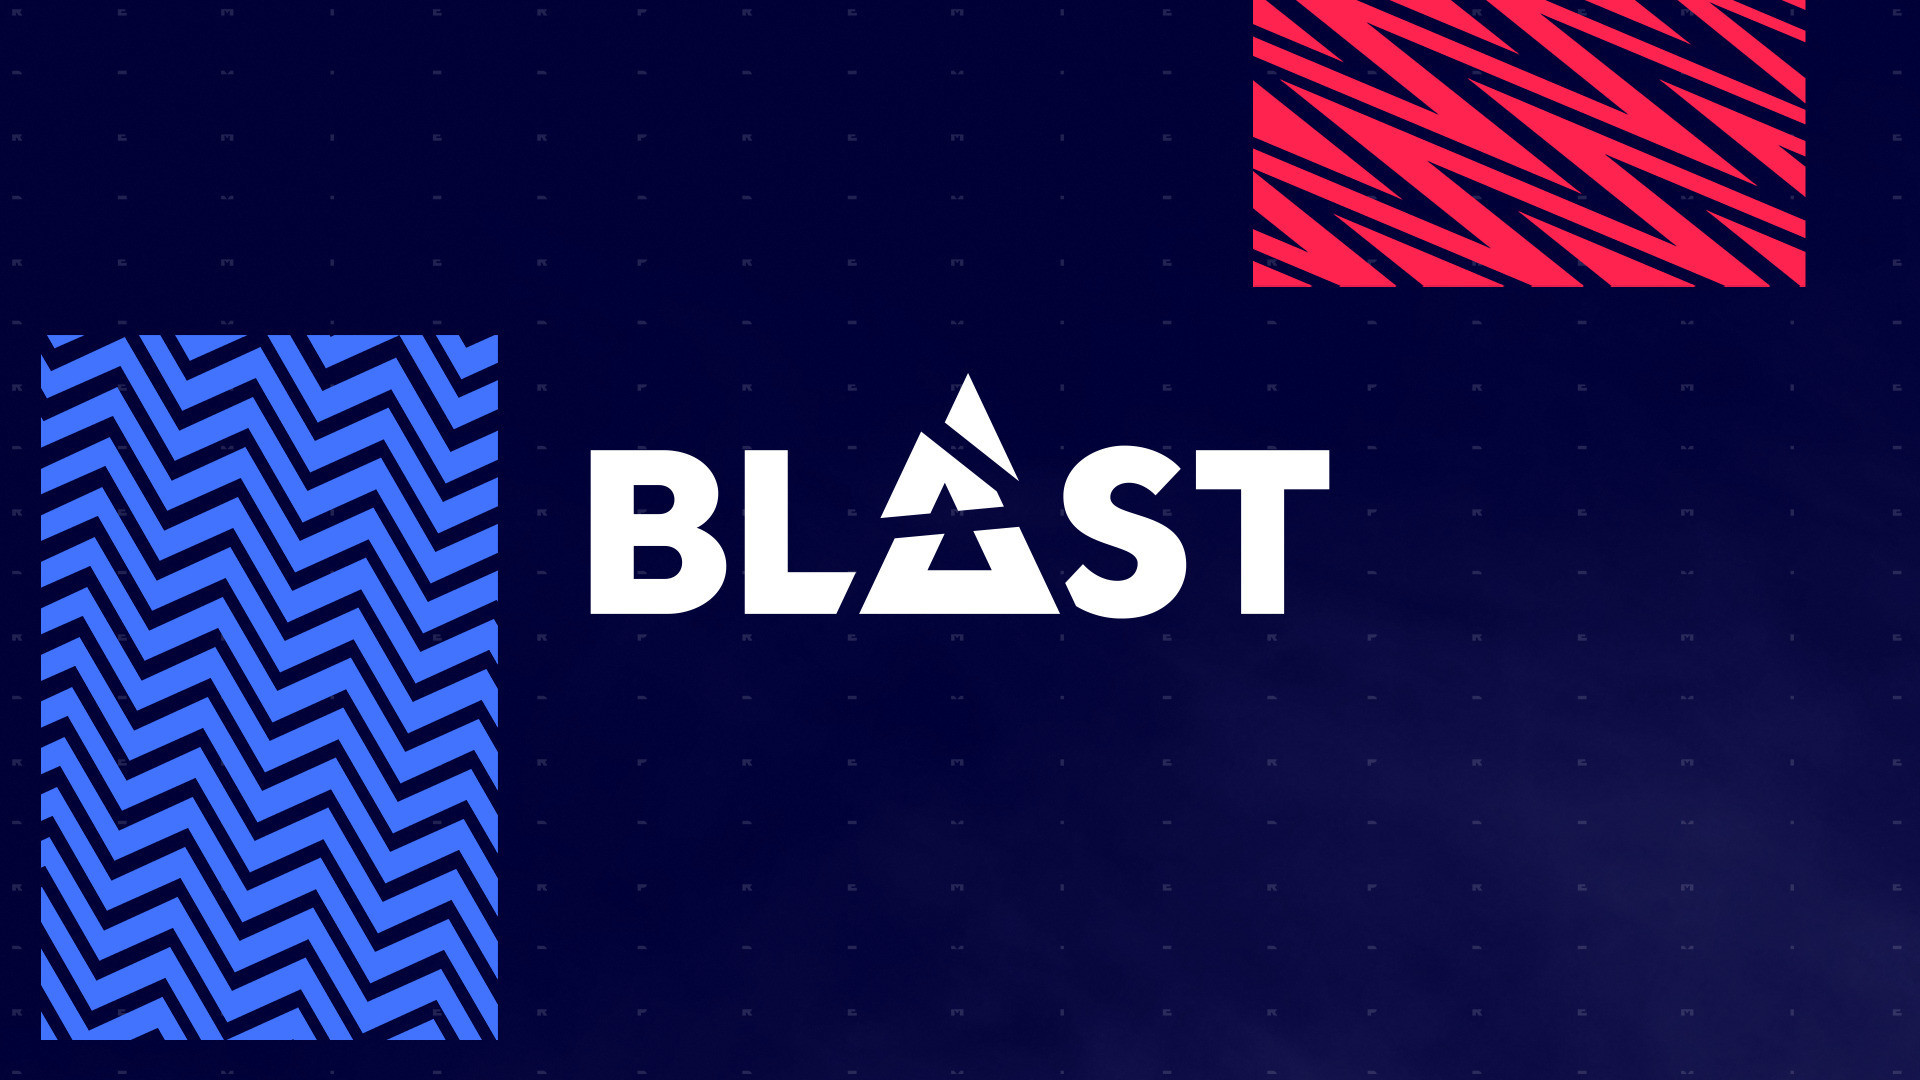 BLAST Premier : Vitality taille patron